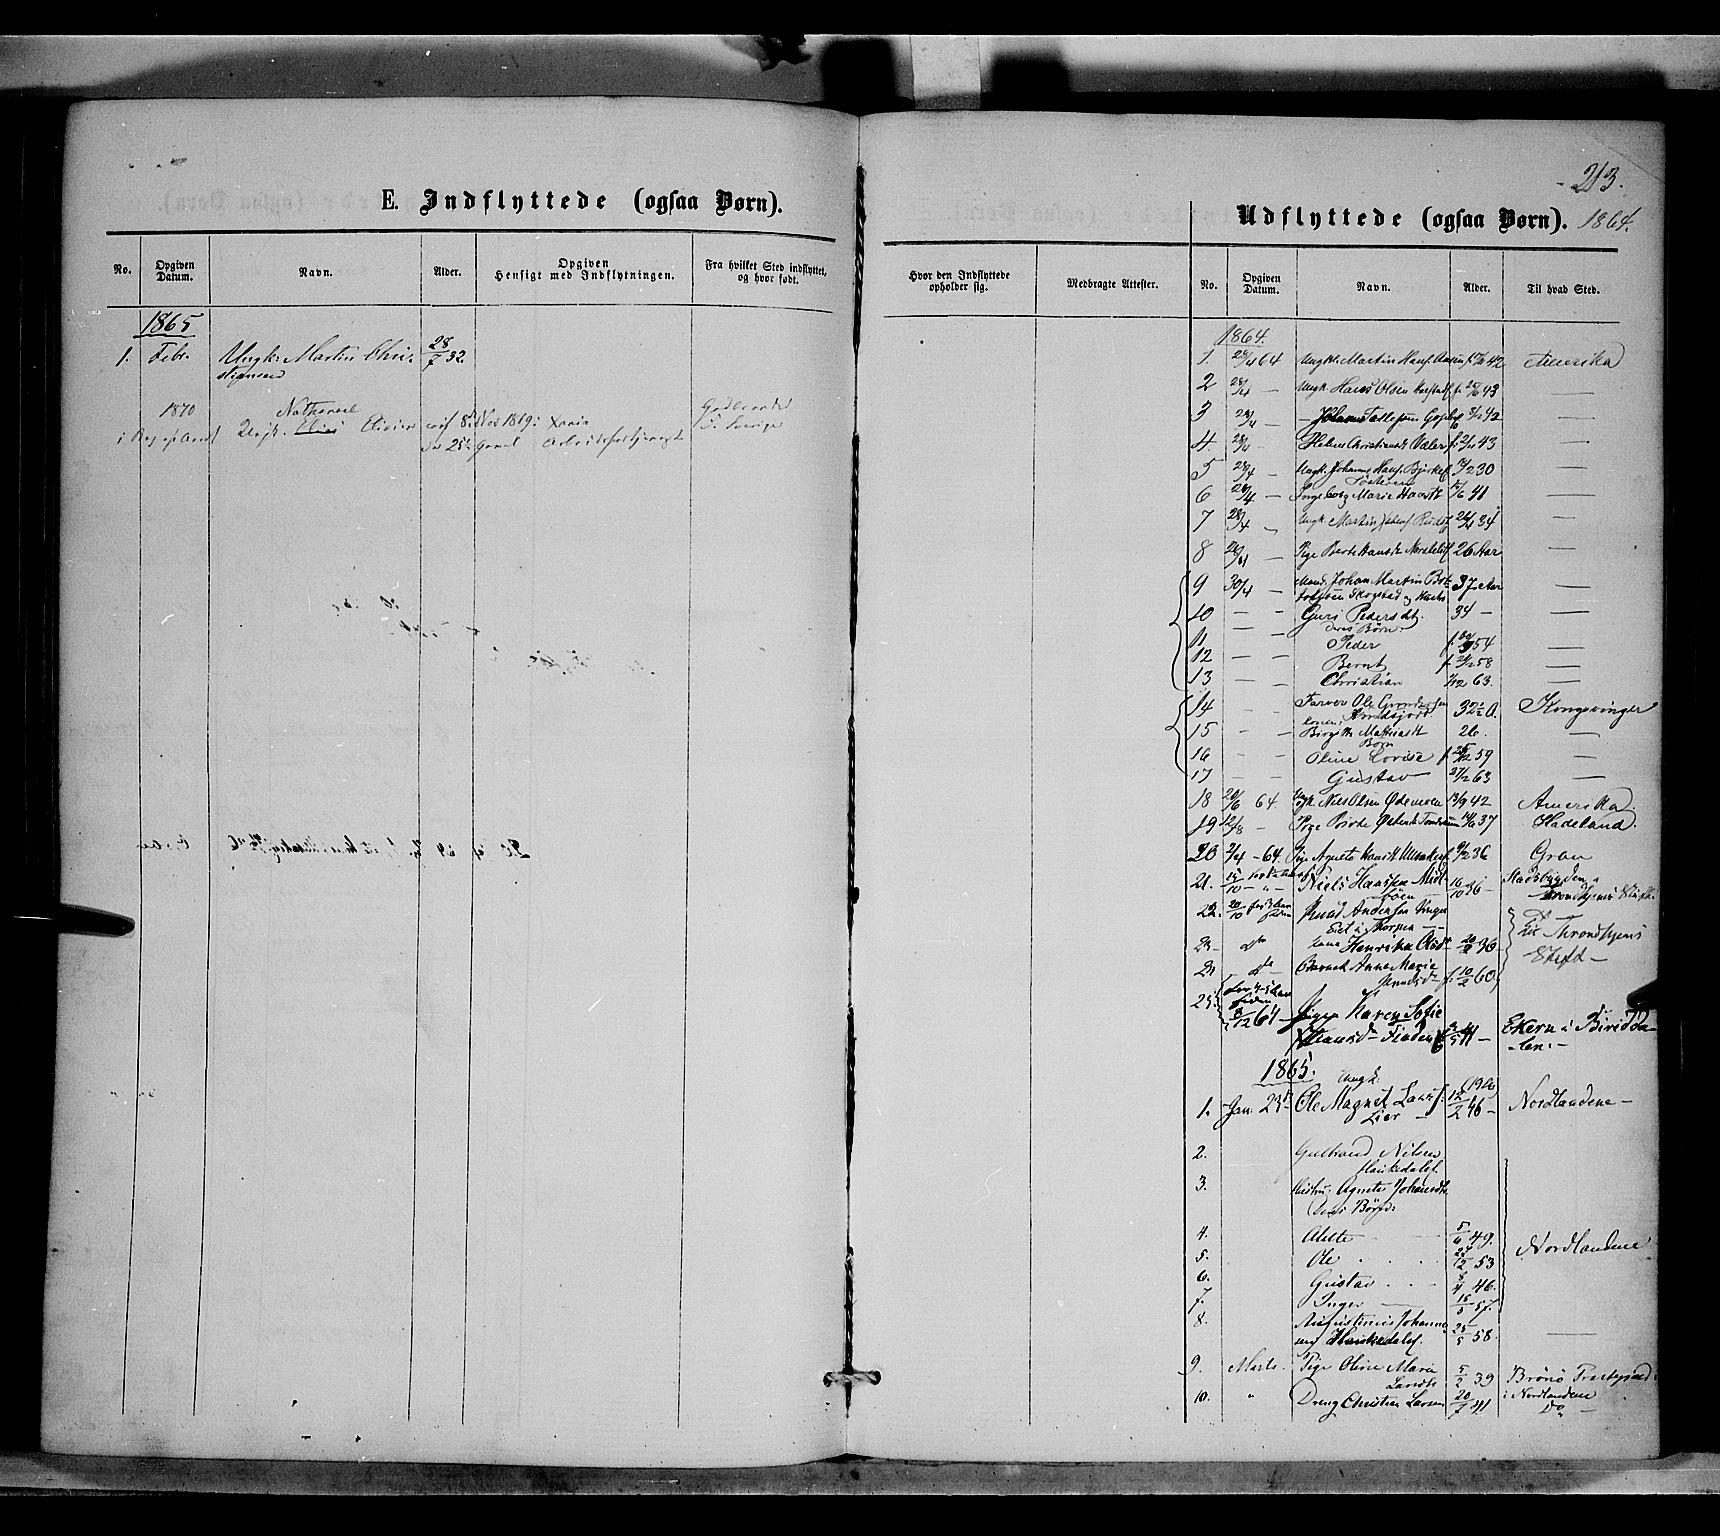 SAH, Nordre Land prestekontor, Ministerialbok nr. 1, 1860-1871, s. 213